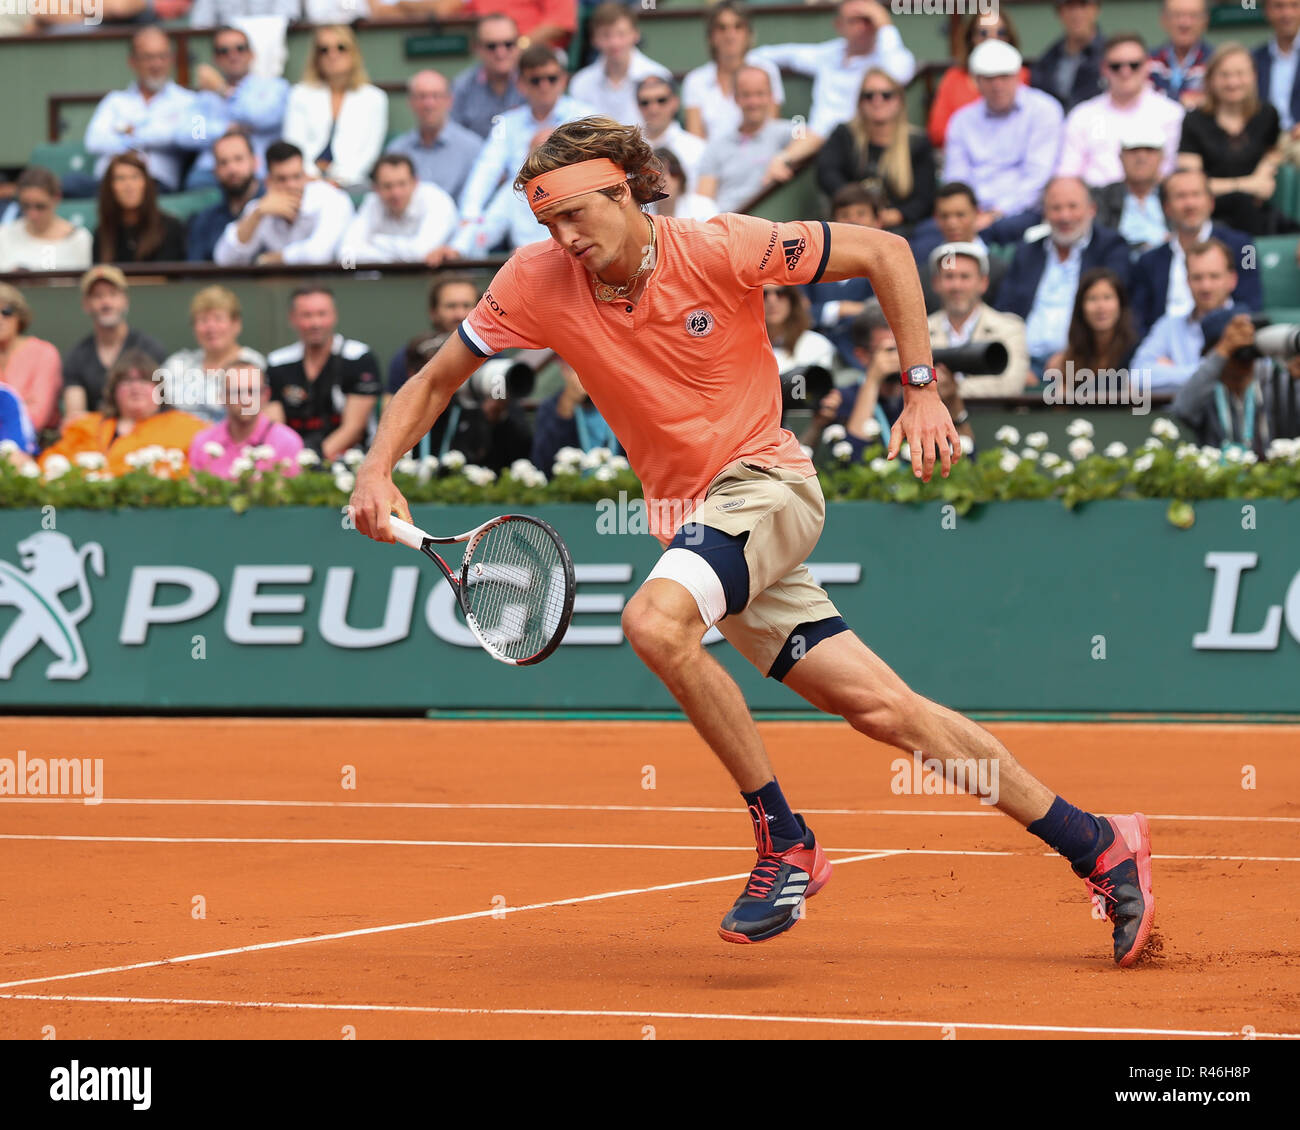 German tennis player Alexander Zverev running forward during French Open 2018 tennis tournament, Paris, France Stock Photo